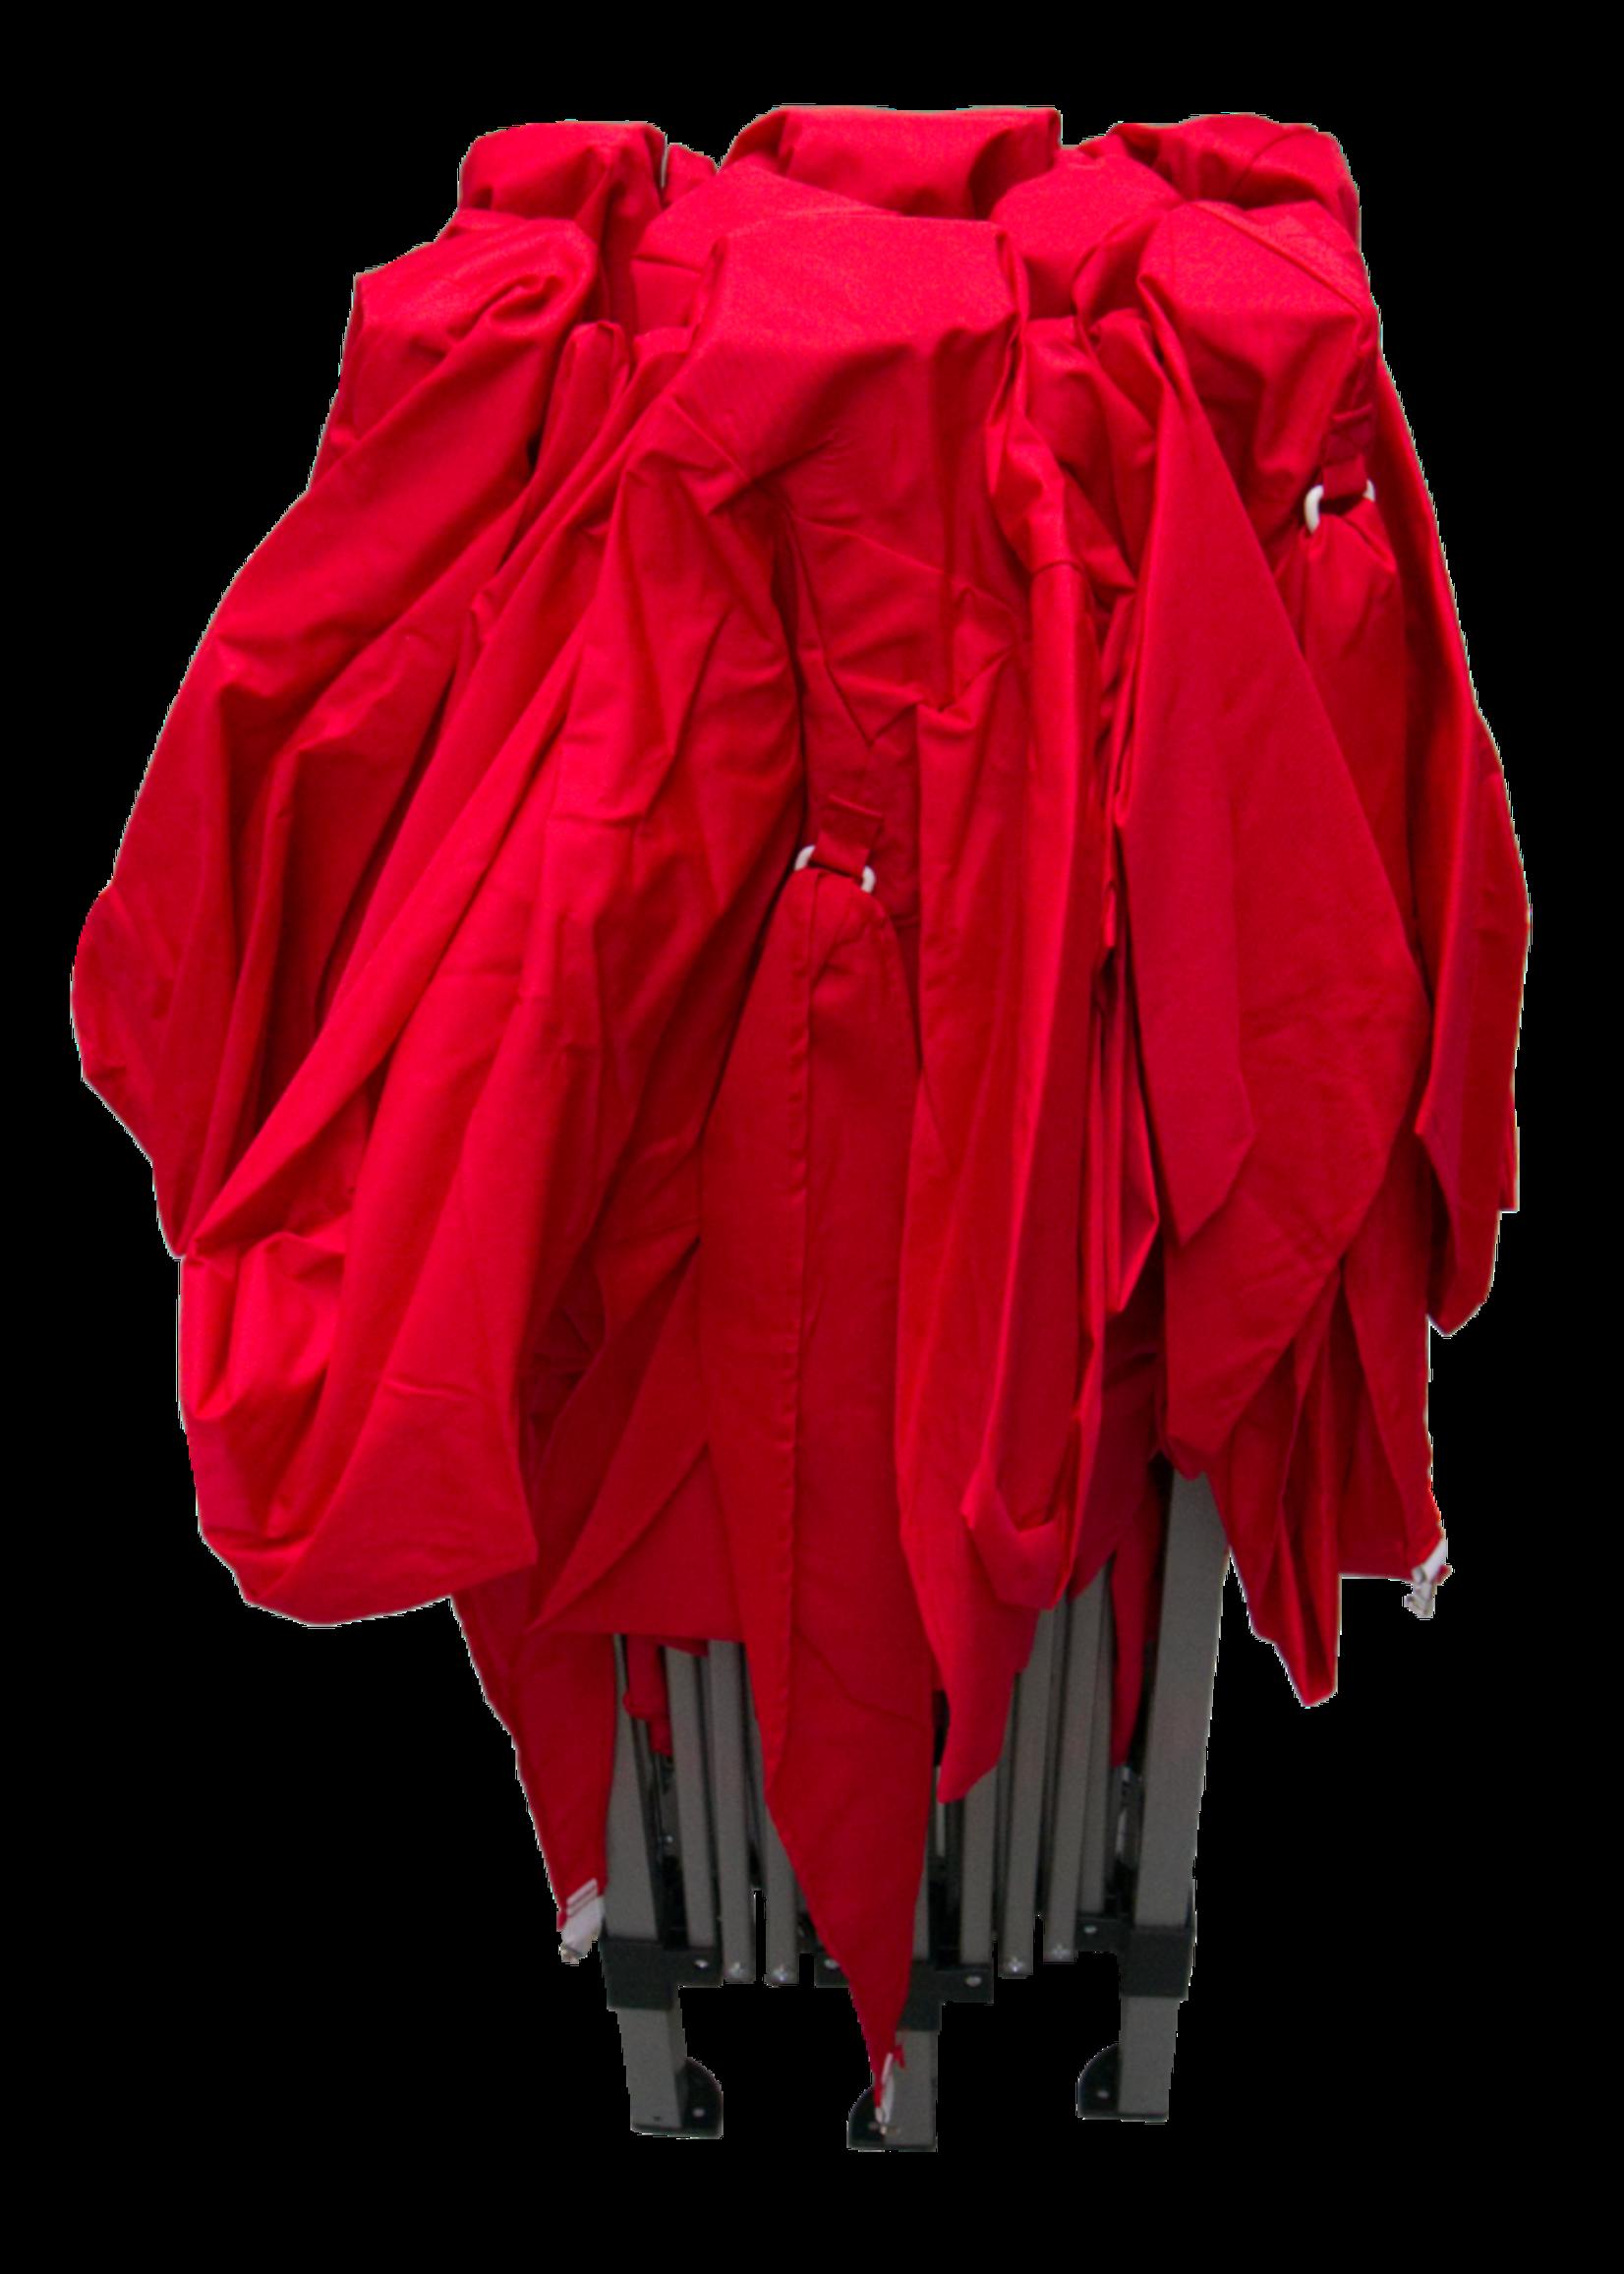 Garden Royal Garden Royal Partytent Easy Up 3x6m opvouwbaar rood